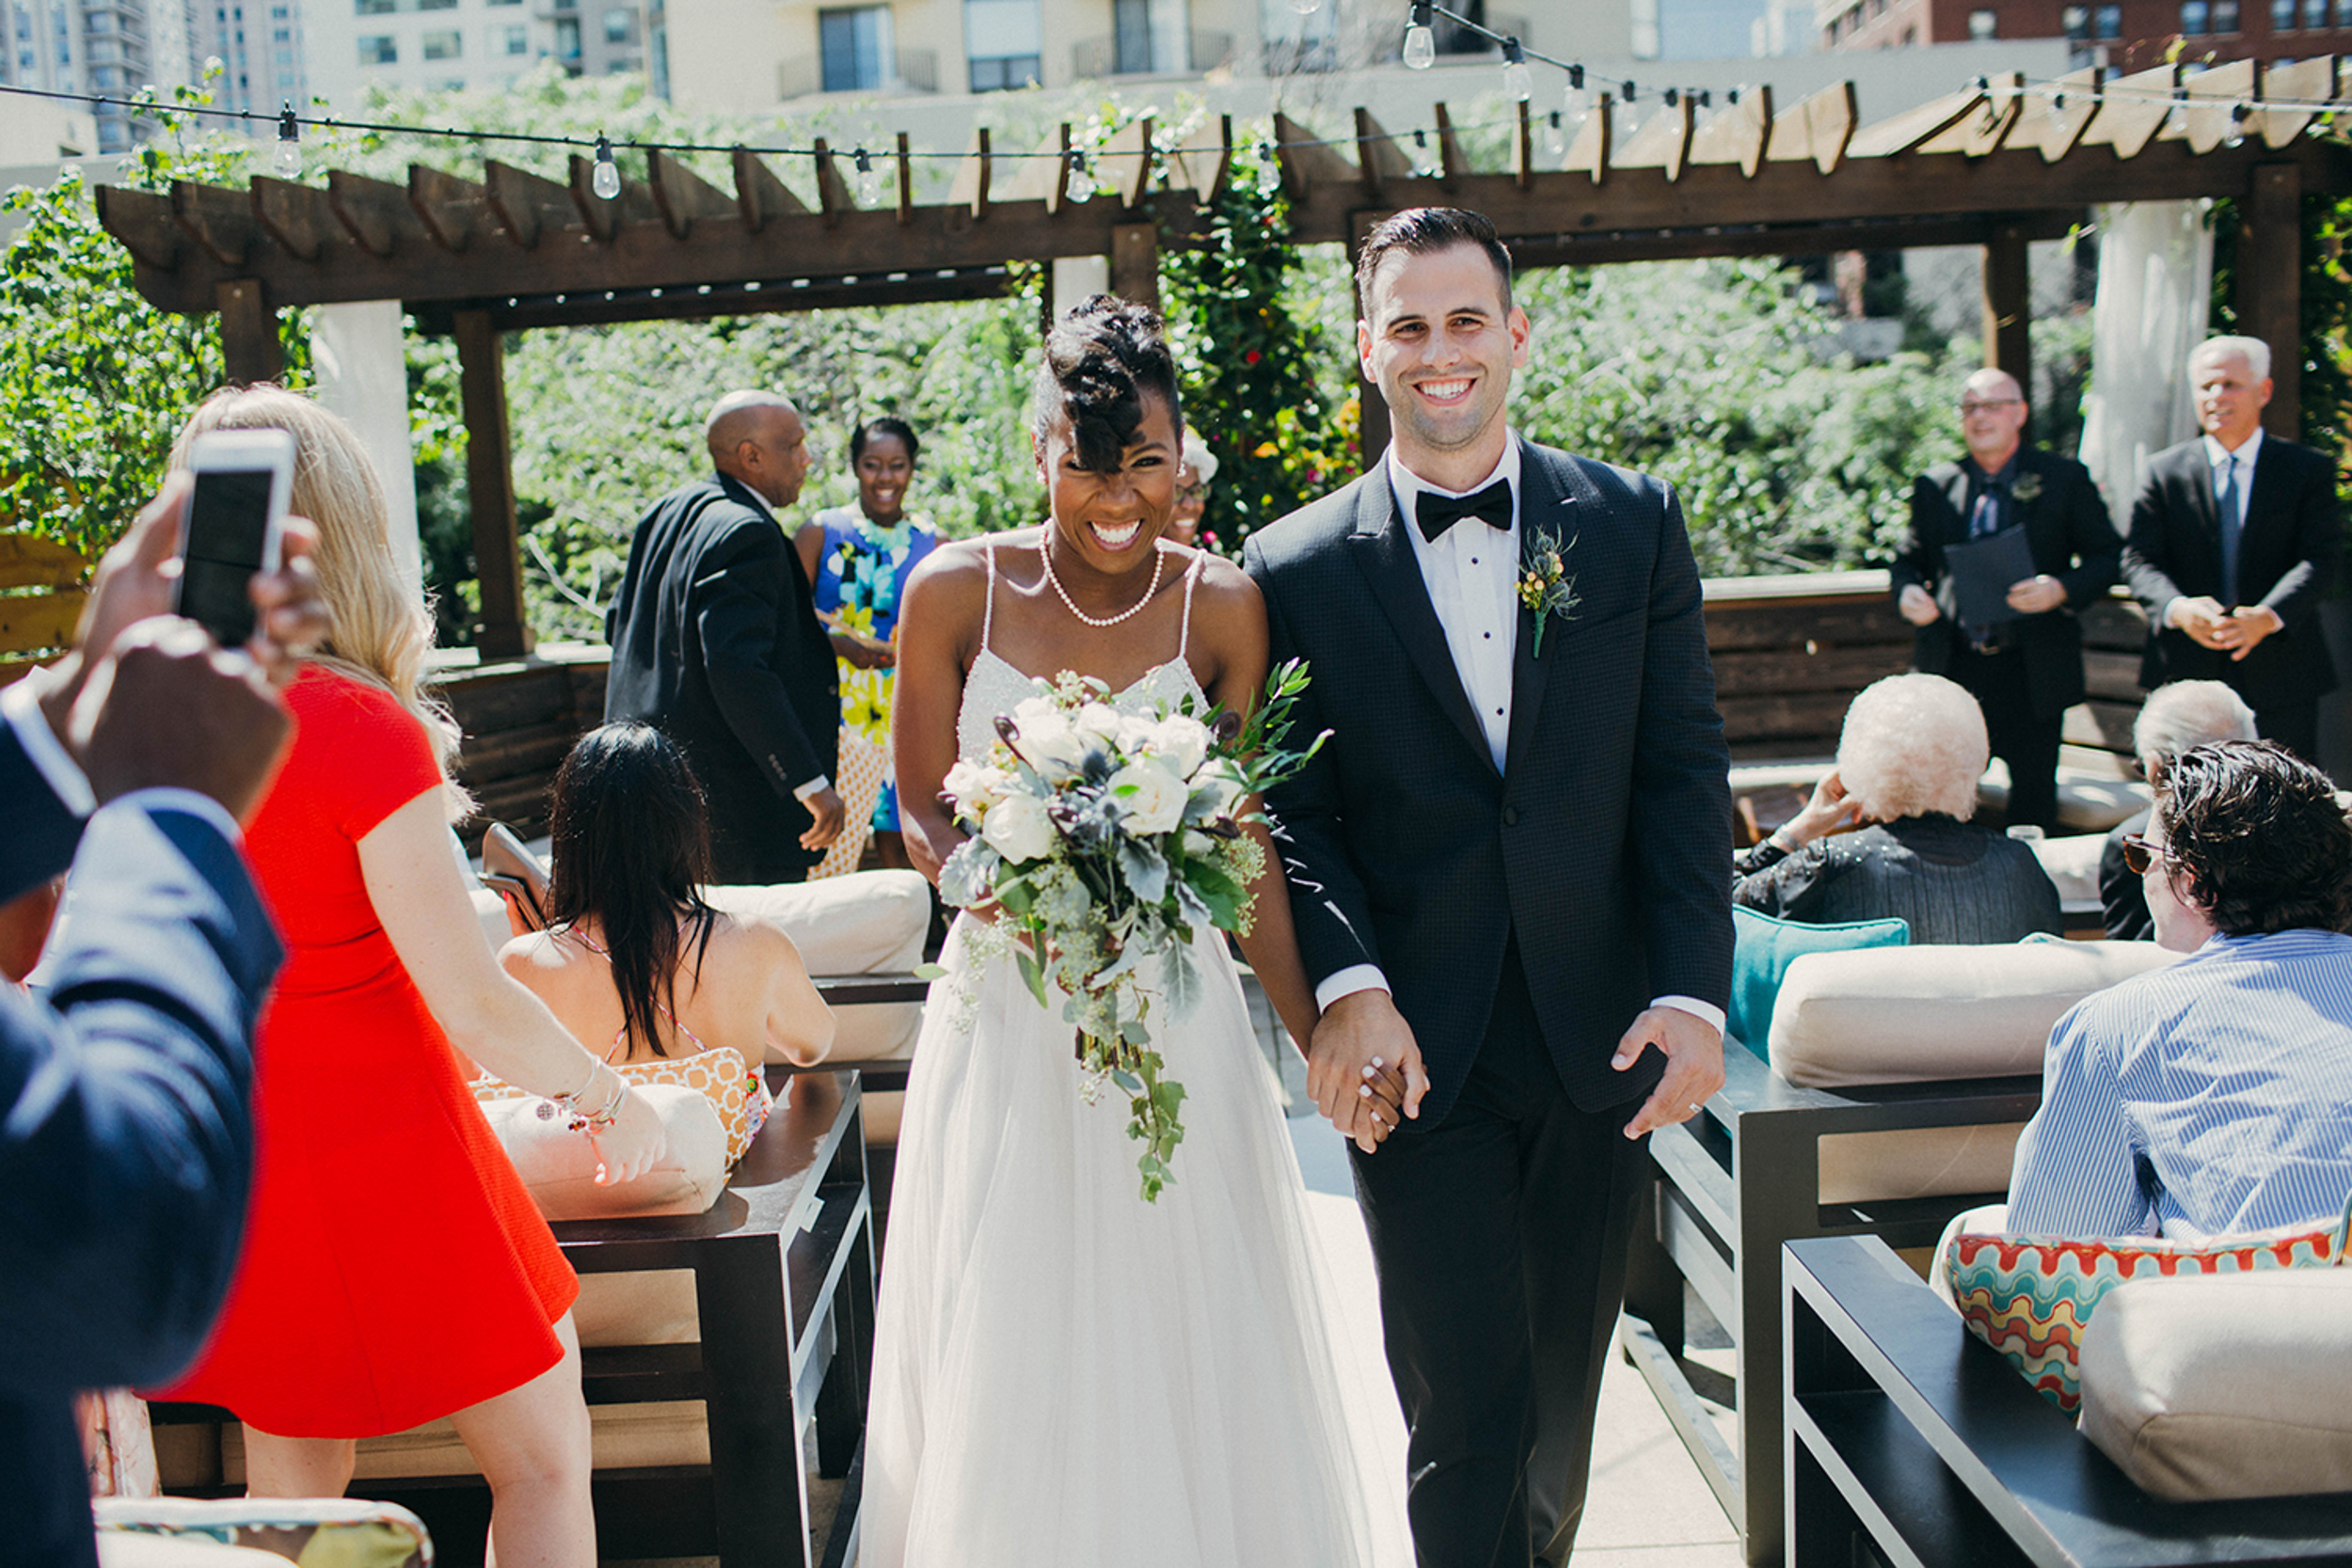 chicago.wedding.urban.intimate.zed451.lake.milton olive park-55.jpg